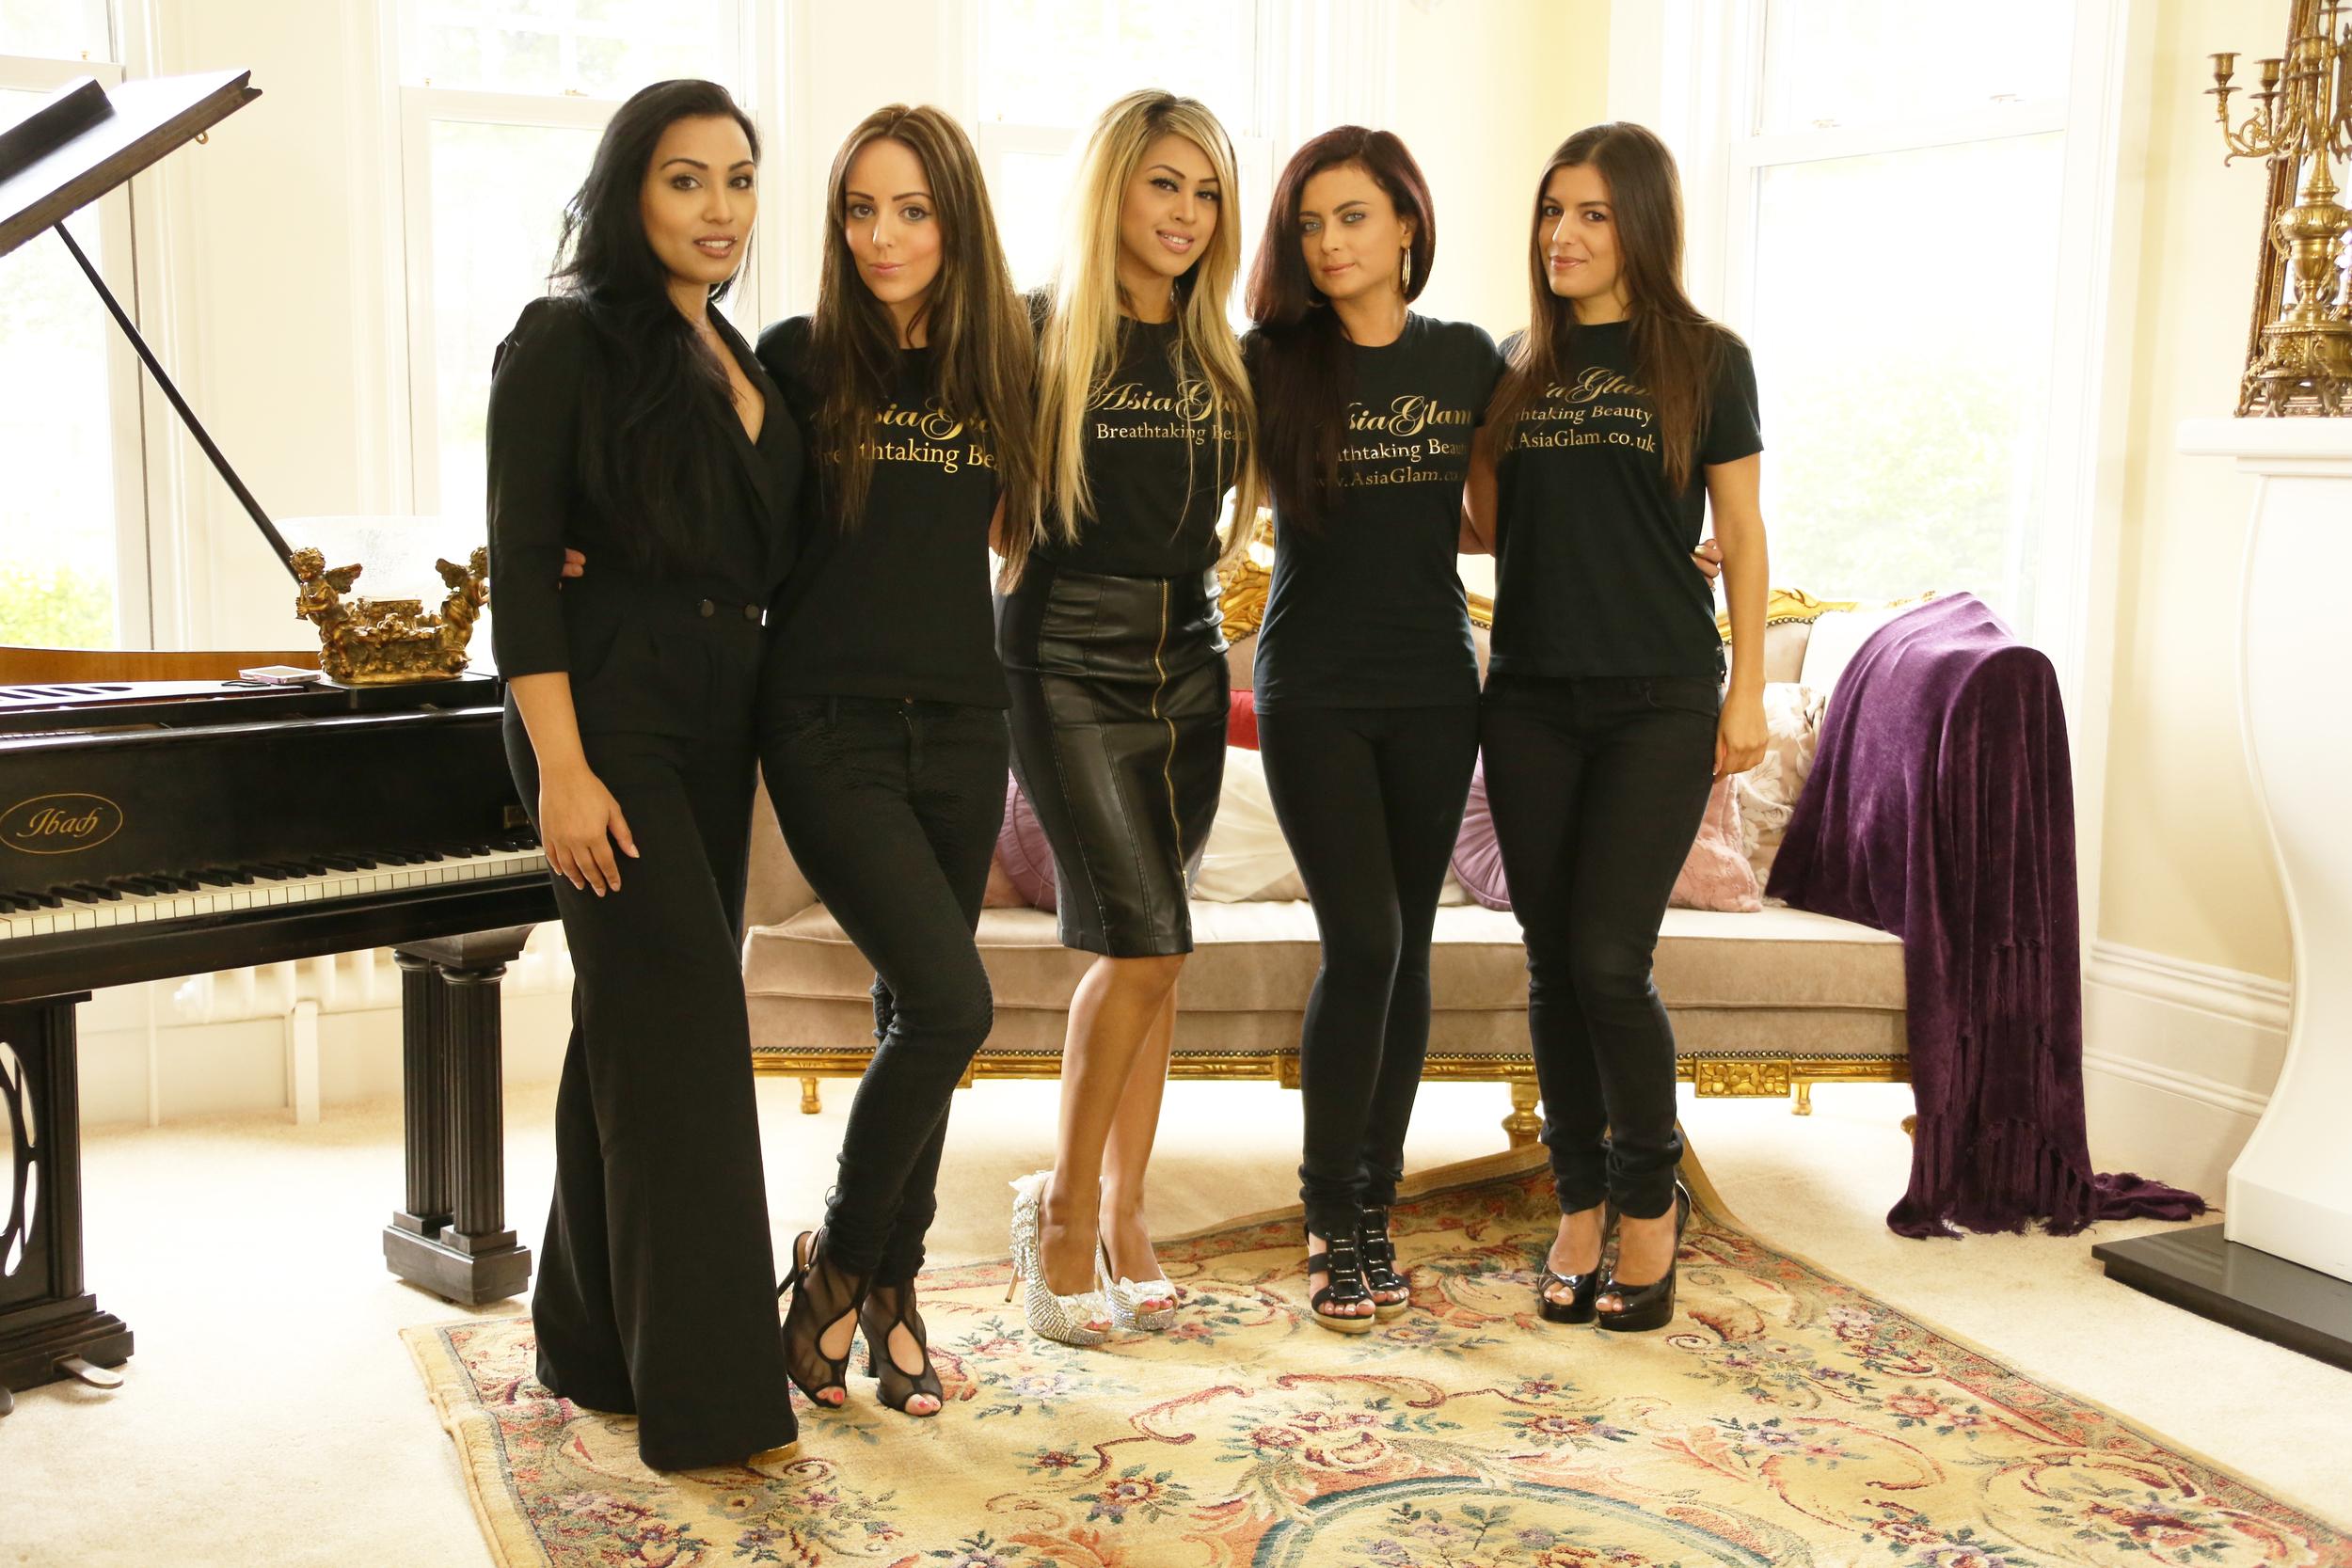 Meettheteam.jpg - please crop the excess space around girls out and lighten slightly.JPG